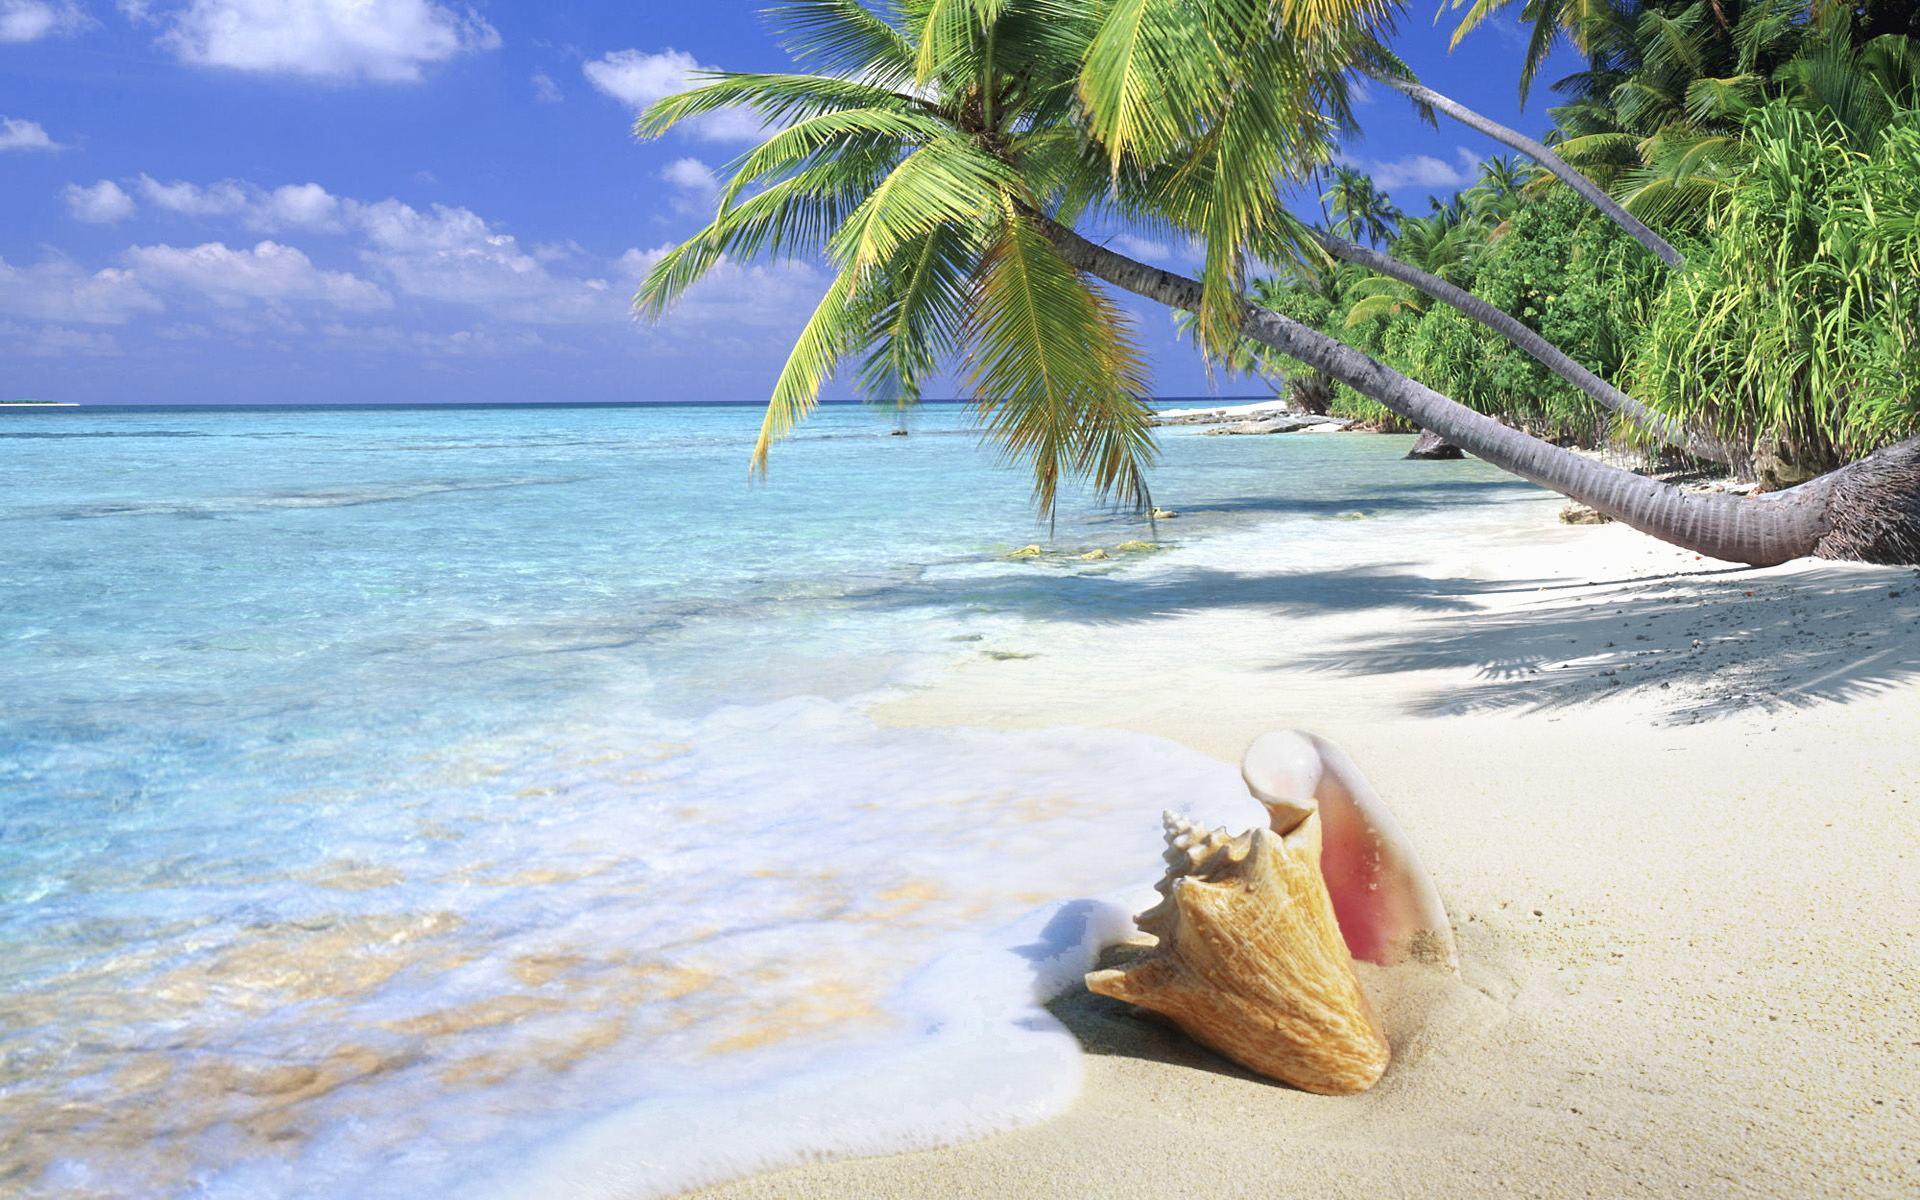 Hd Tropical Island Beach Paradise Wallpapers And Backgrounds: Tropical Beach Desktop Backgrounds